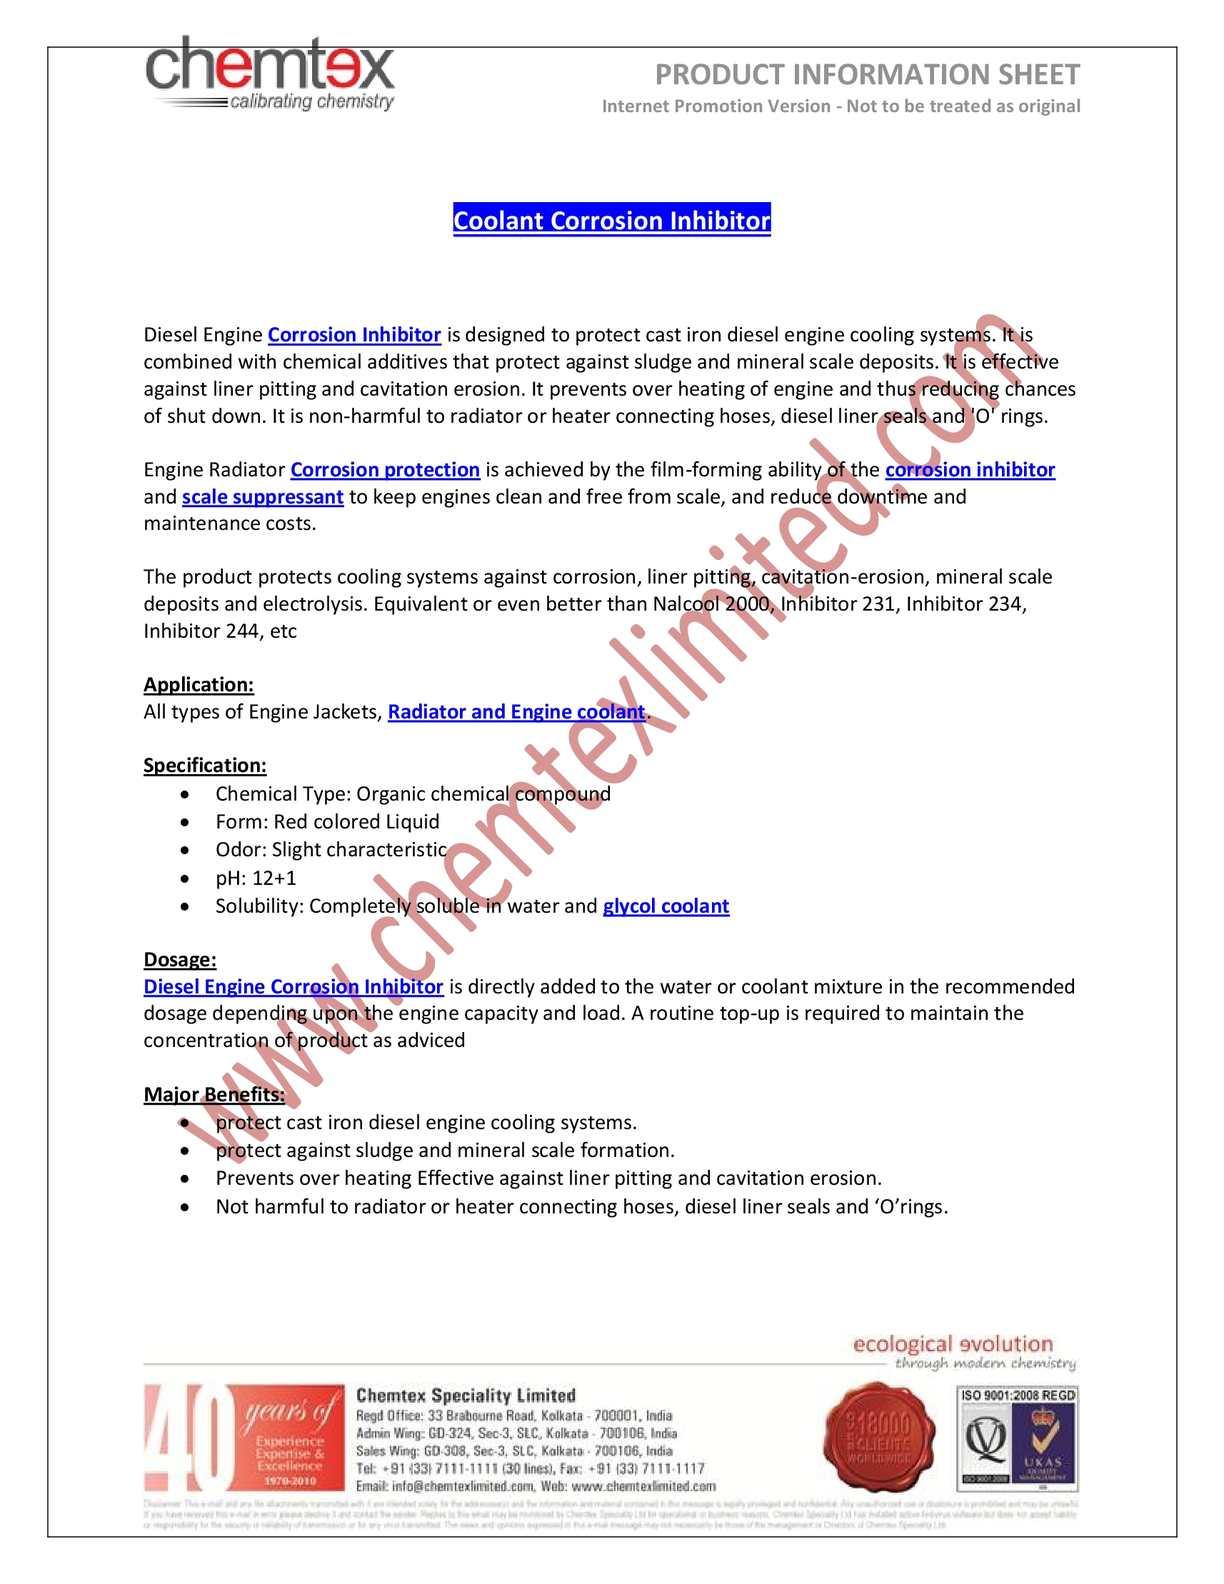 Calaméo - Coolant Corrosion Inhibitor